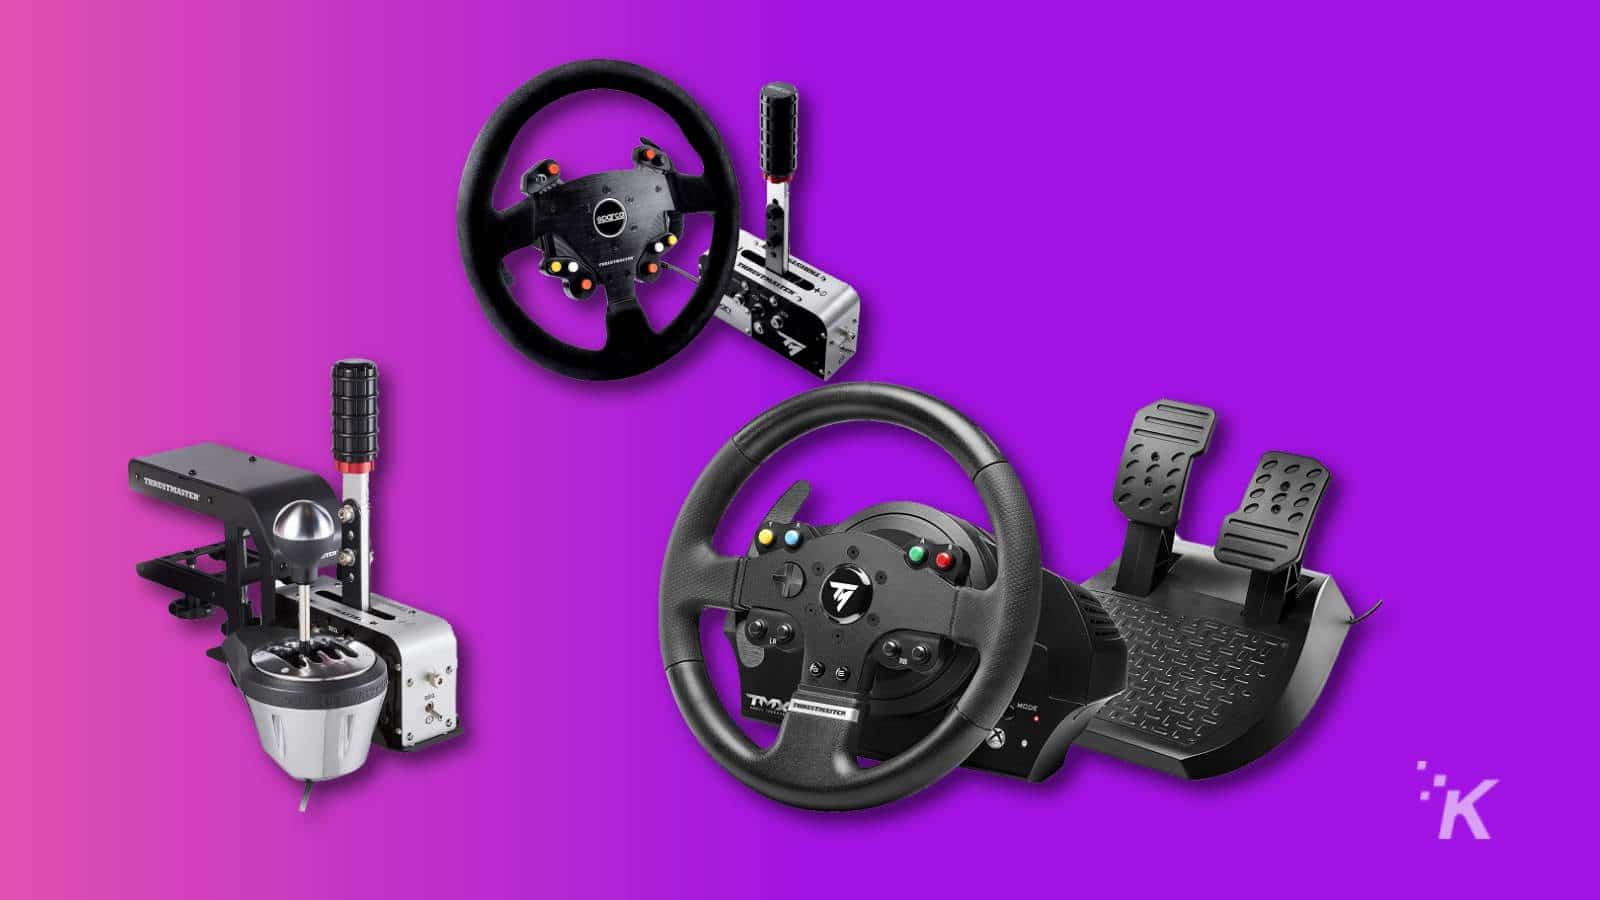 thrustmaster racing sim gear